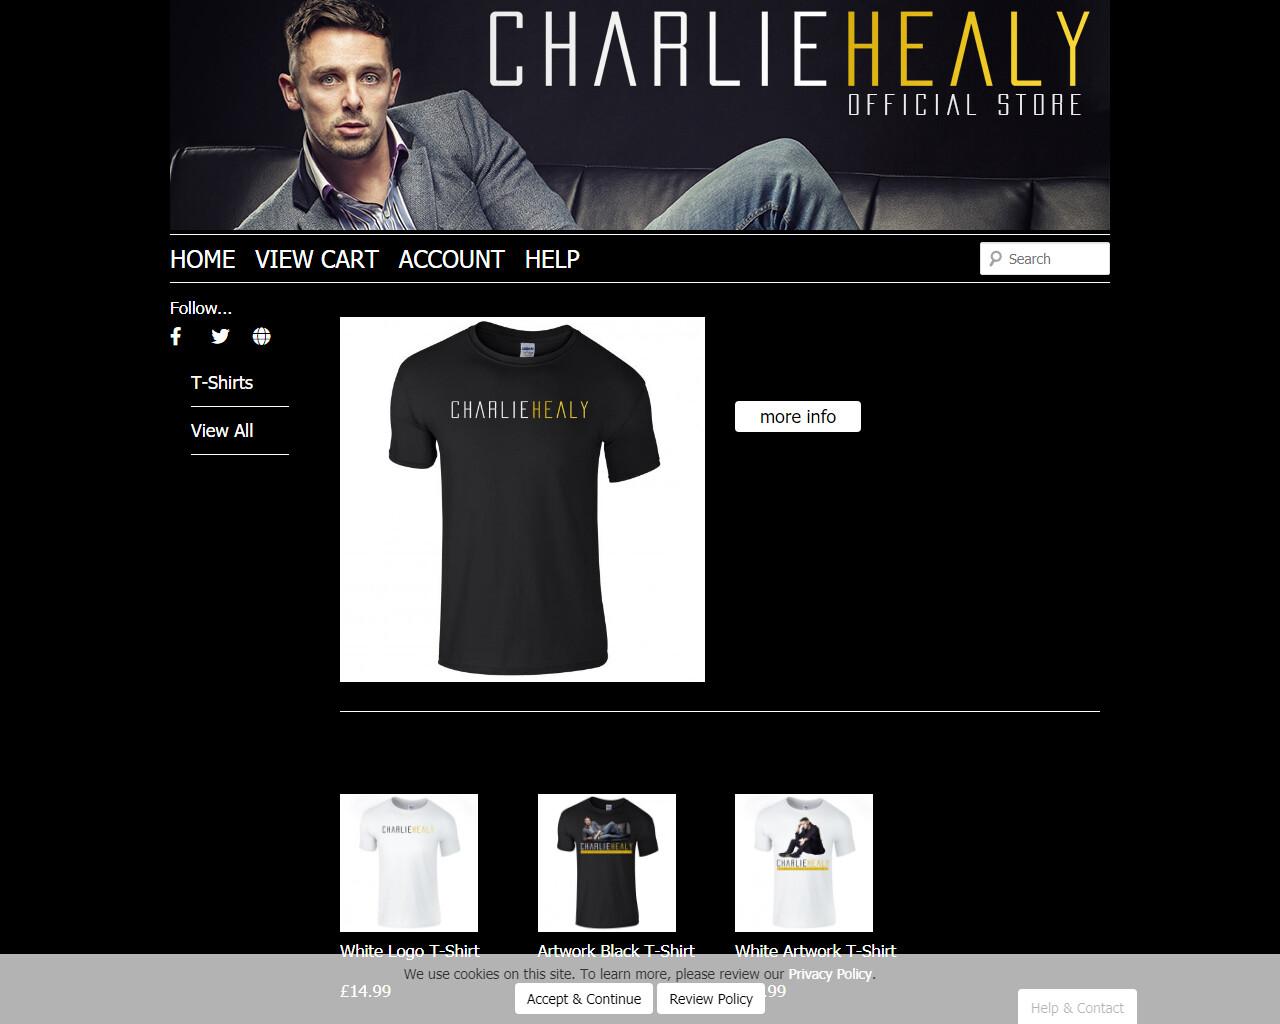 Charlie Healy